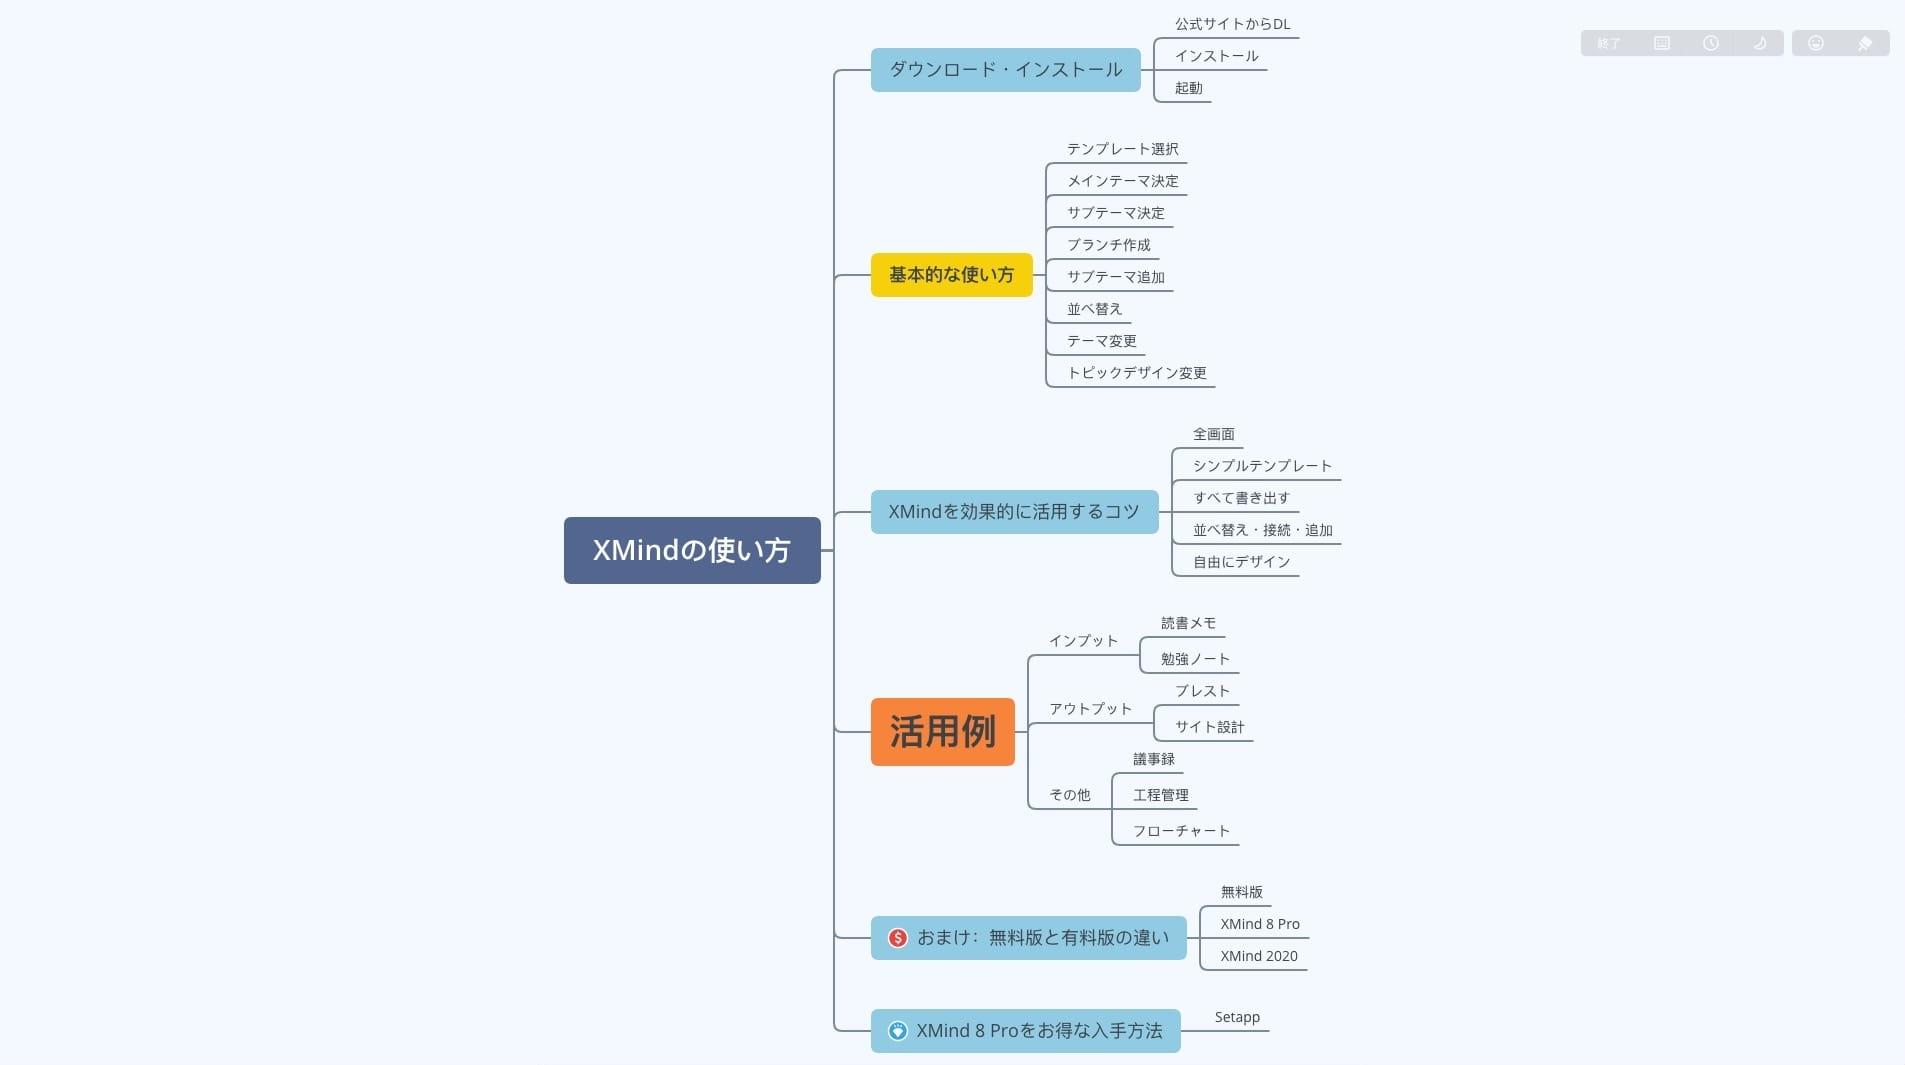 XMind:完成したマップ